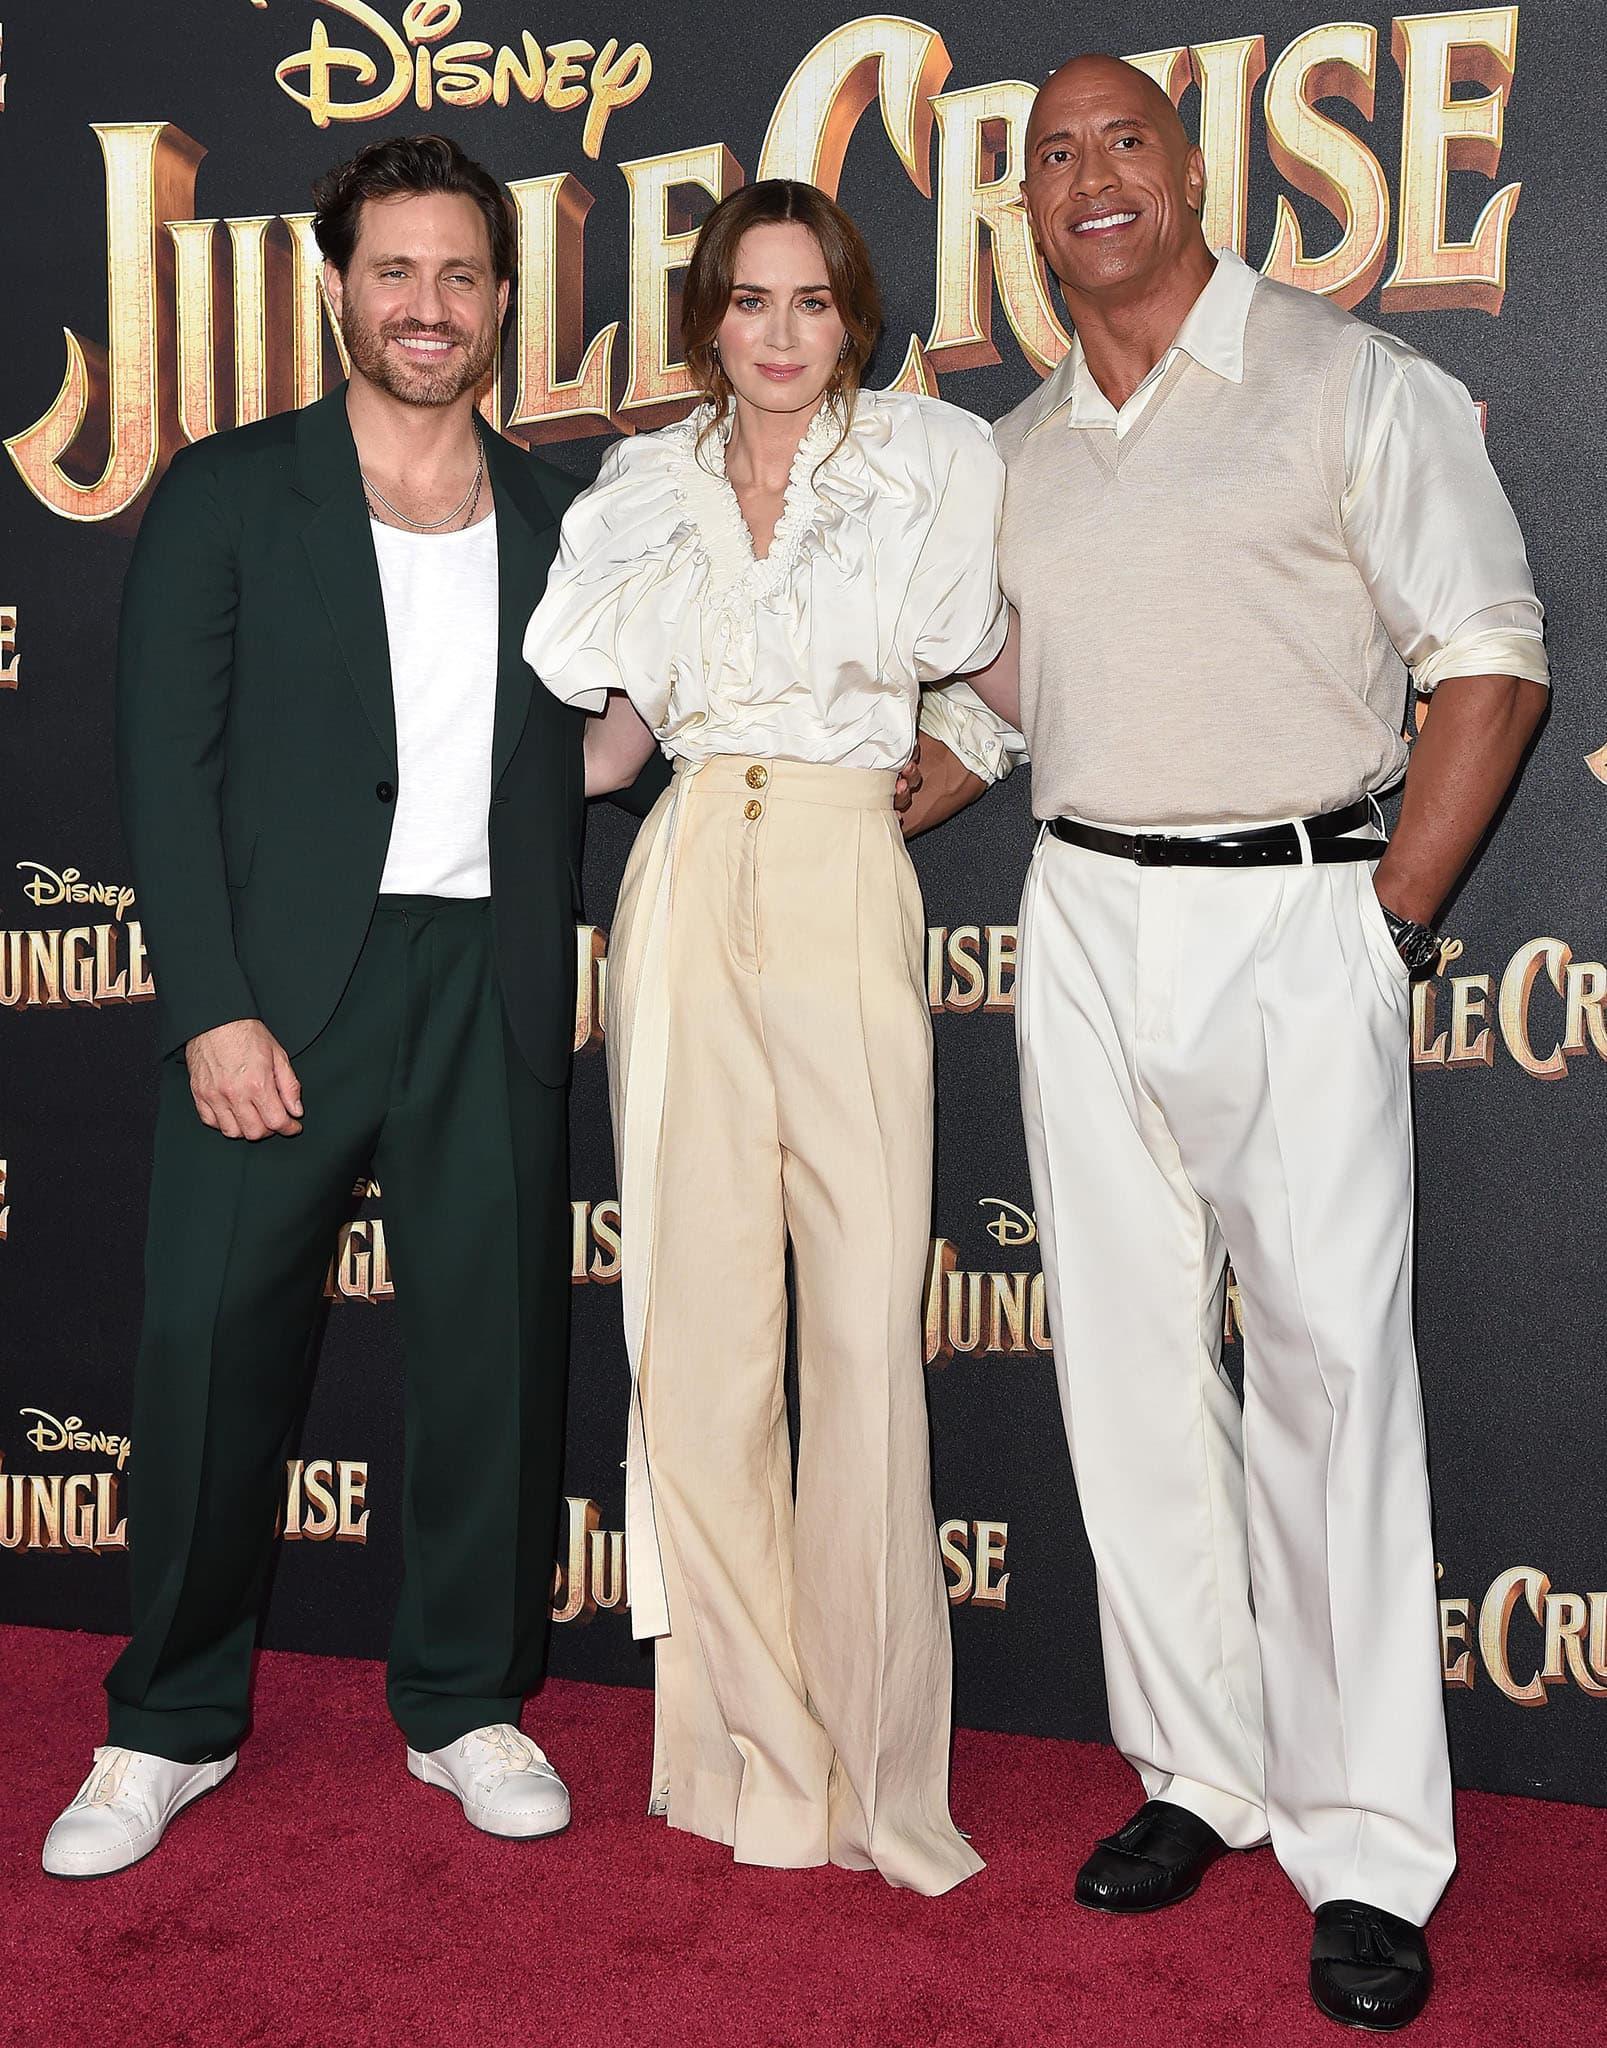 Edgar Ramirez, Emily Blunt, and Dwayne Johnson at the red carpet premiere of Jungle Cruise movie at Disneyland's Fantasyland Theater